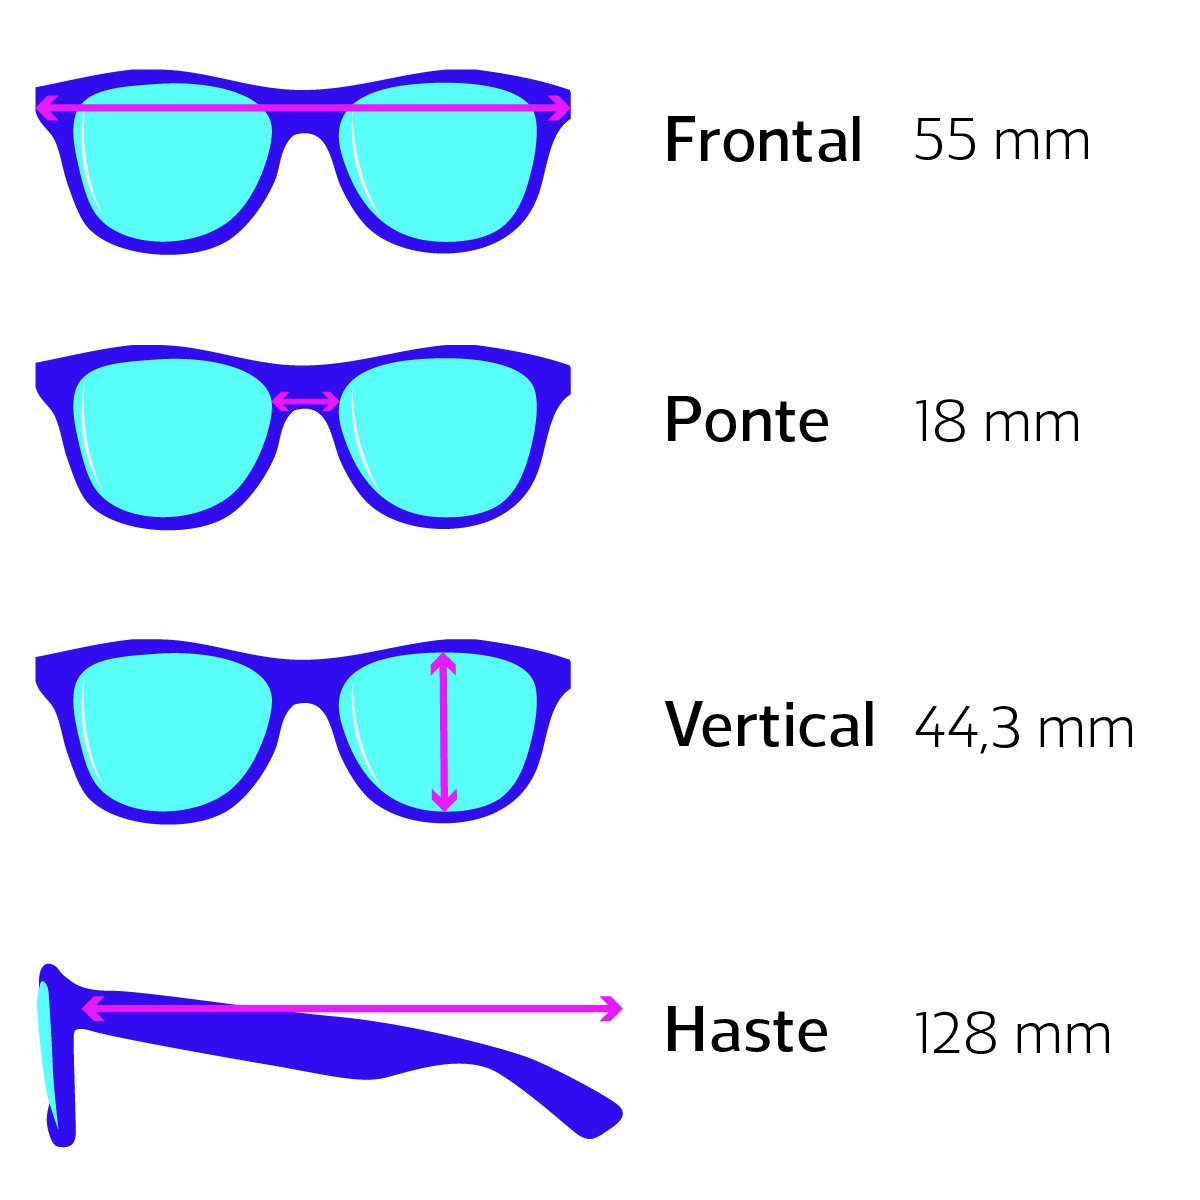 37fafb7e974f2 Óculos Oakley Enduro Masculino - Compre Agora   Netshoes